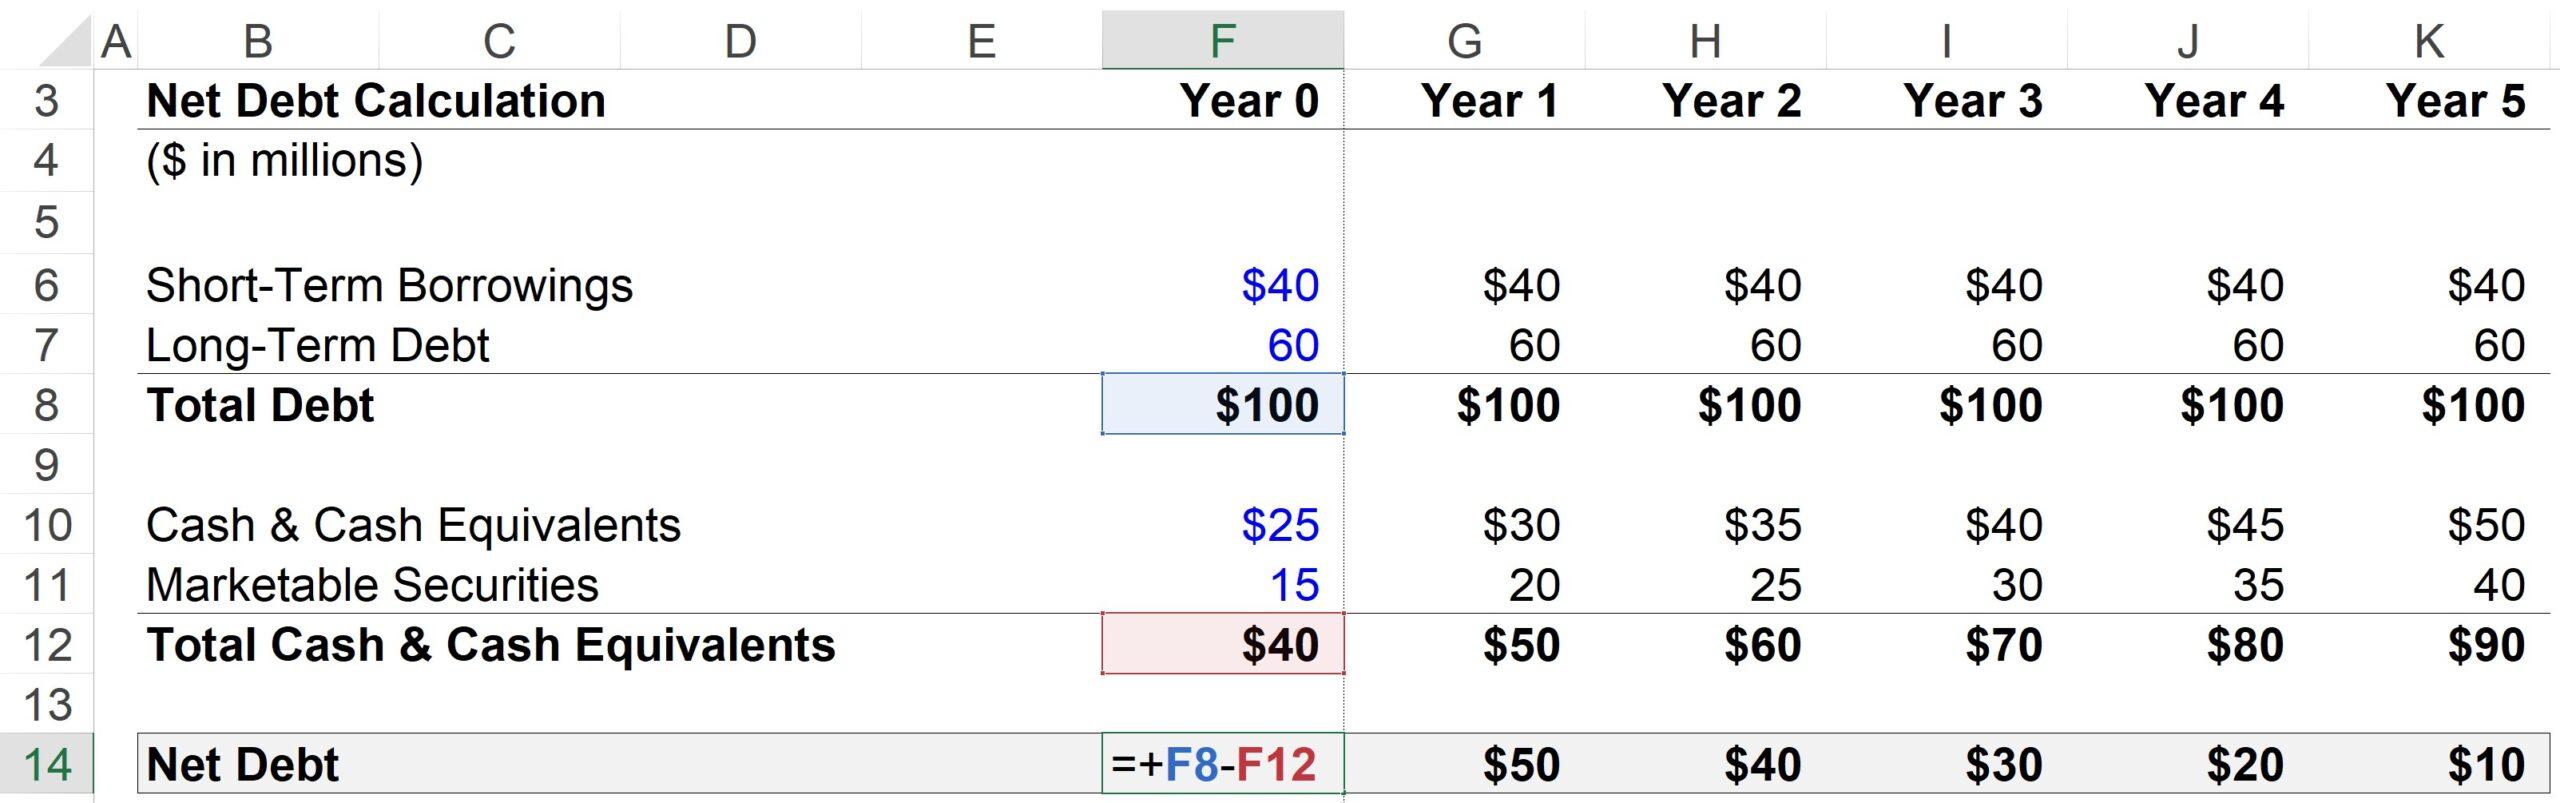 Net Debt Excel Formula